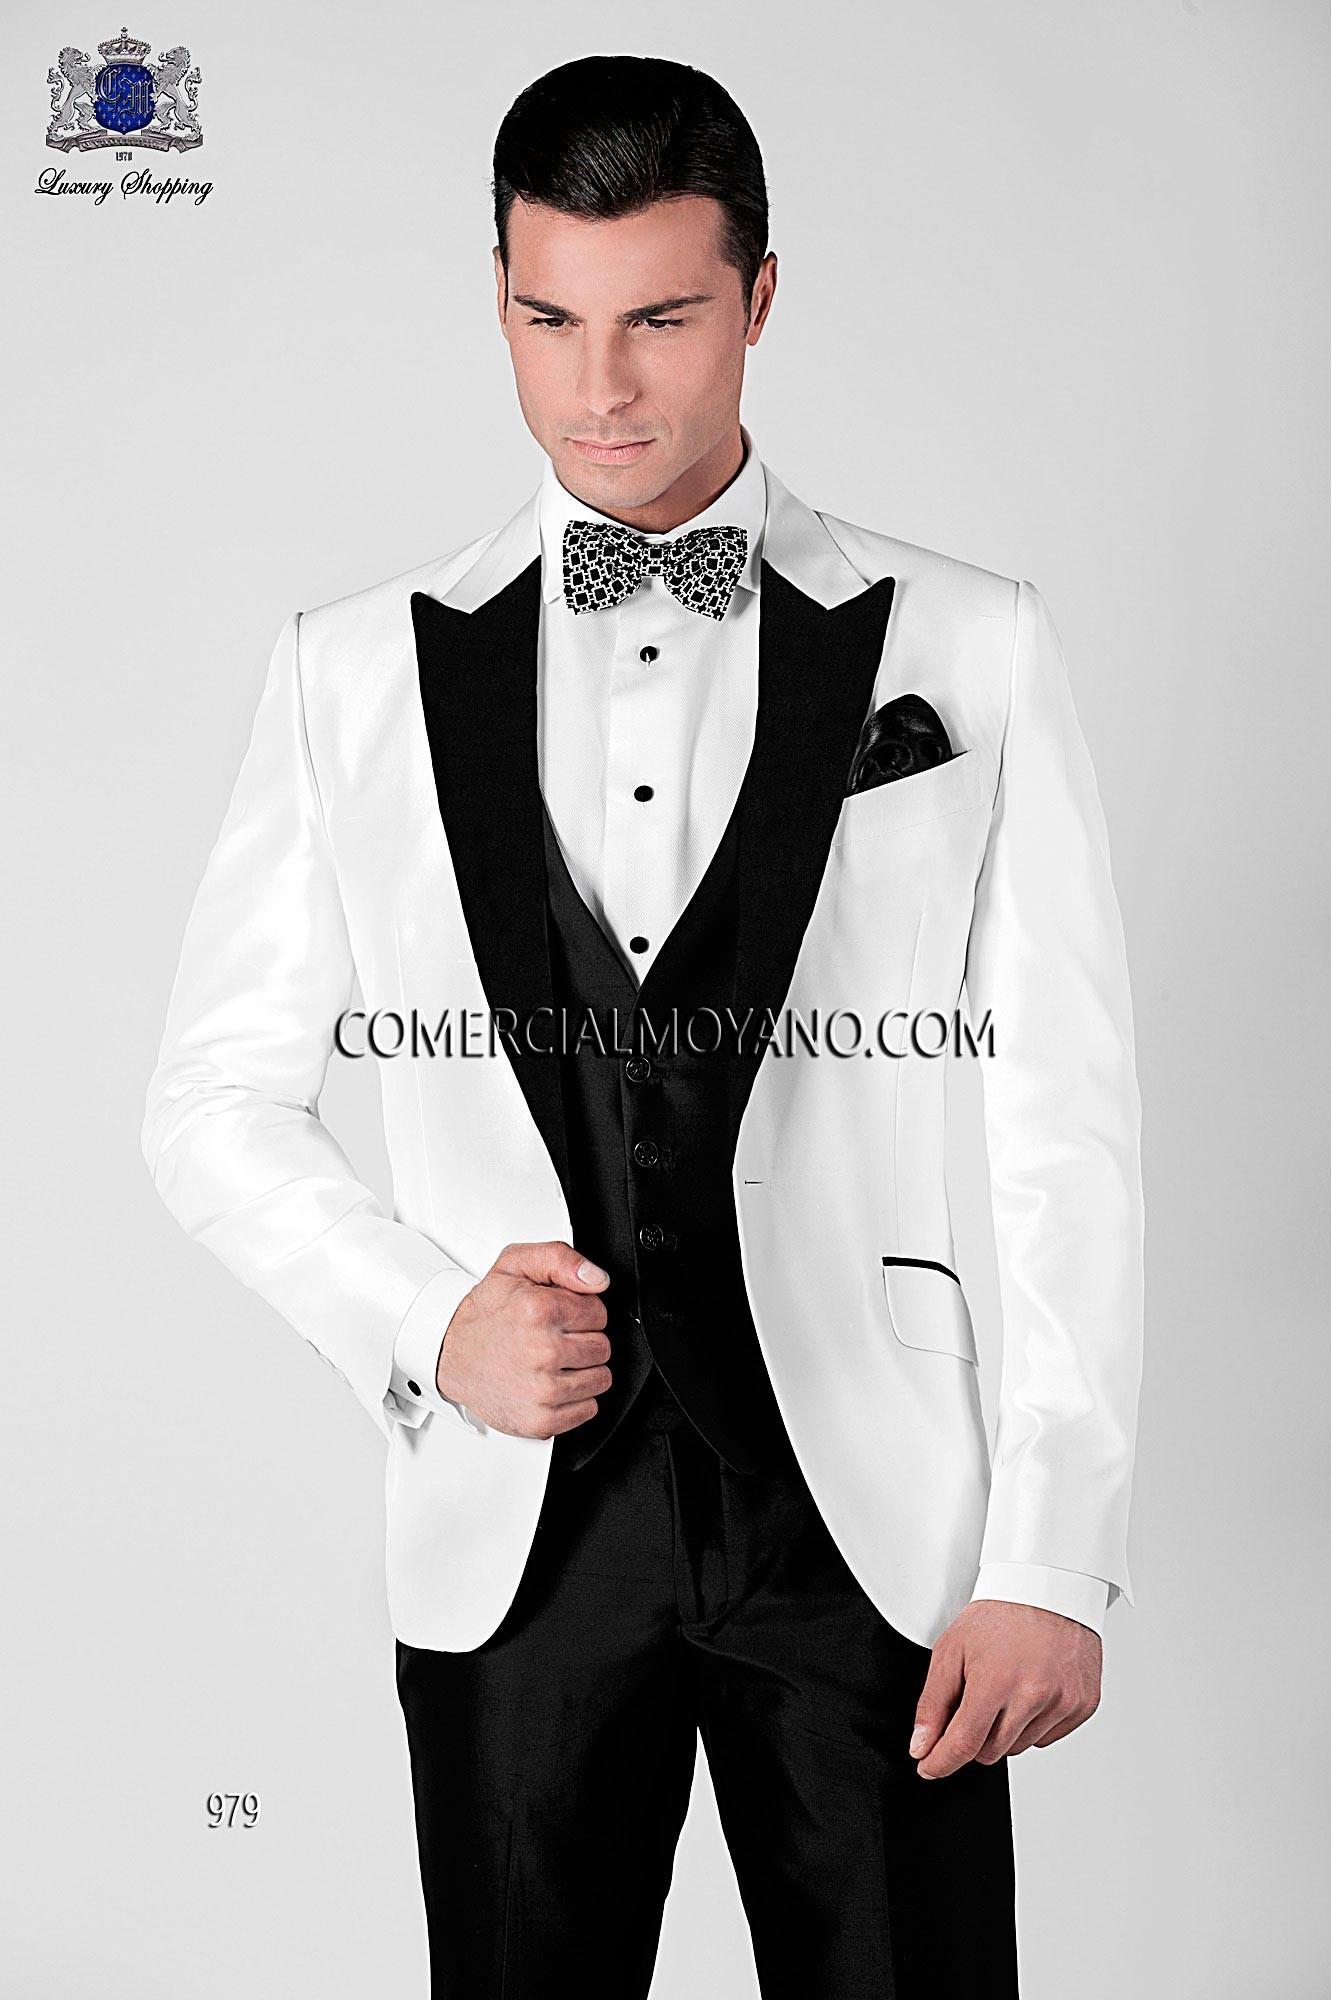 Bien connu Costumes de mariage blancs - Comercial Moyano GE67